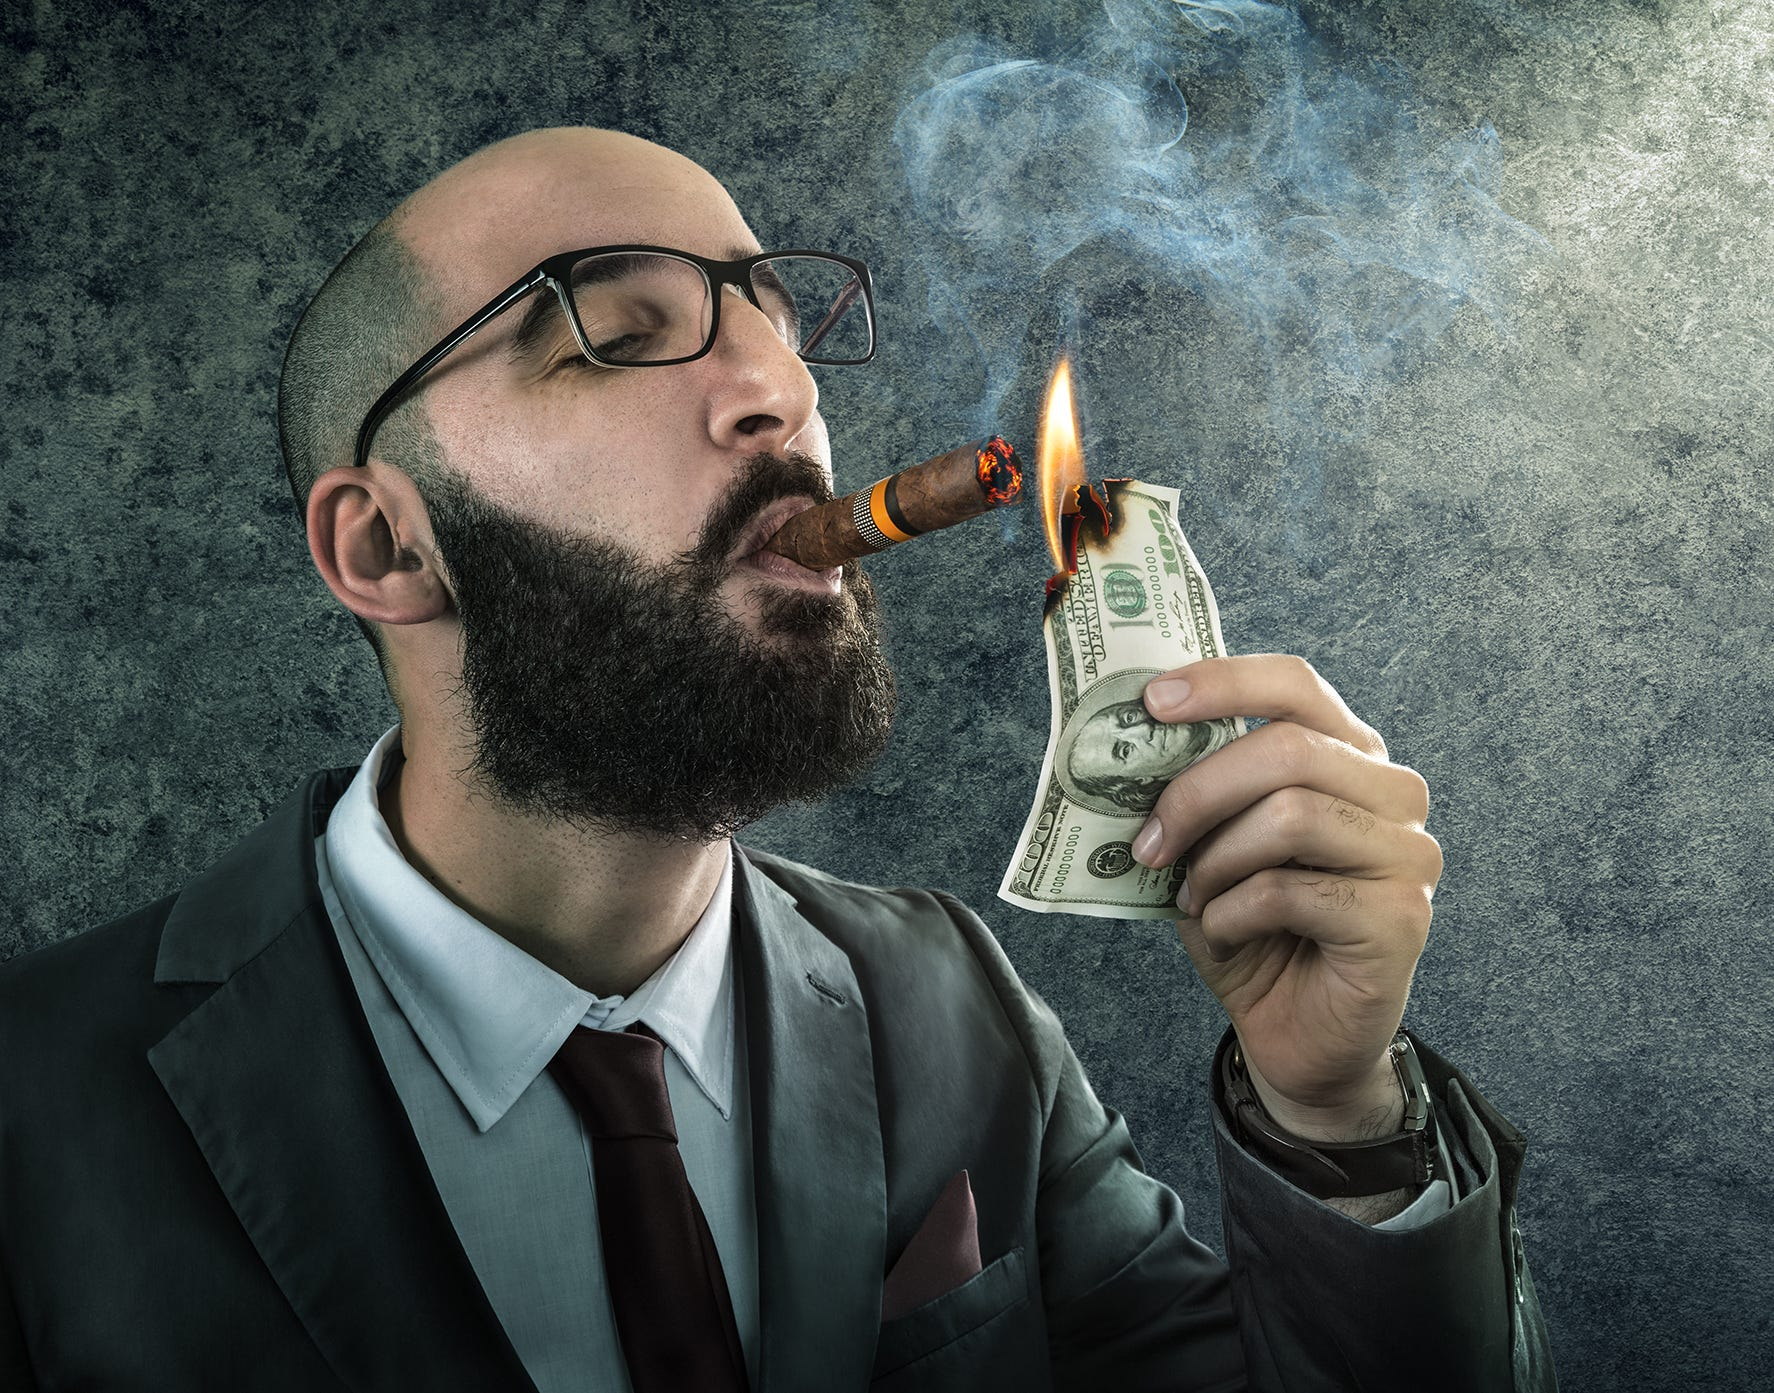 Money Burning Businessman Arrogant